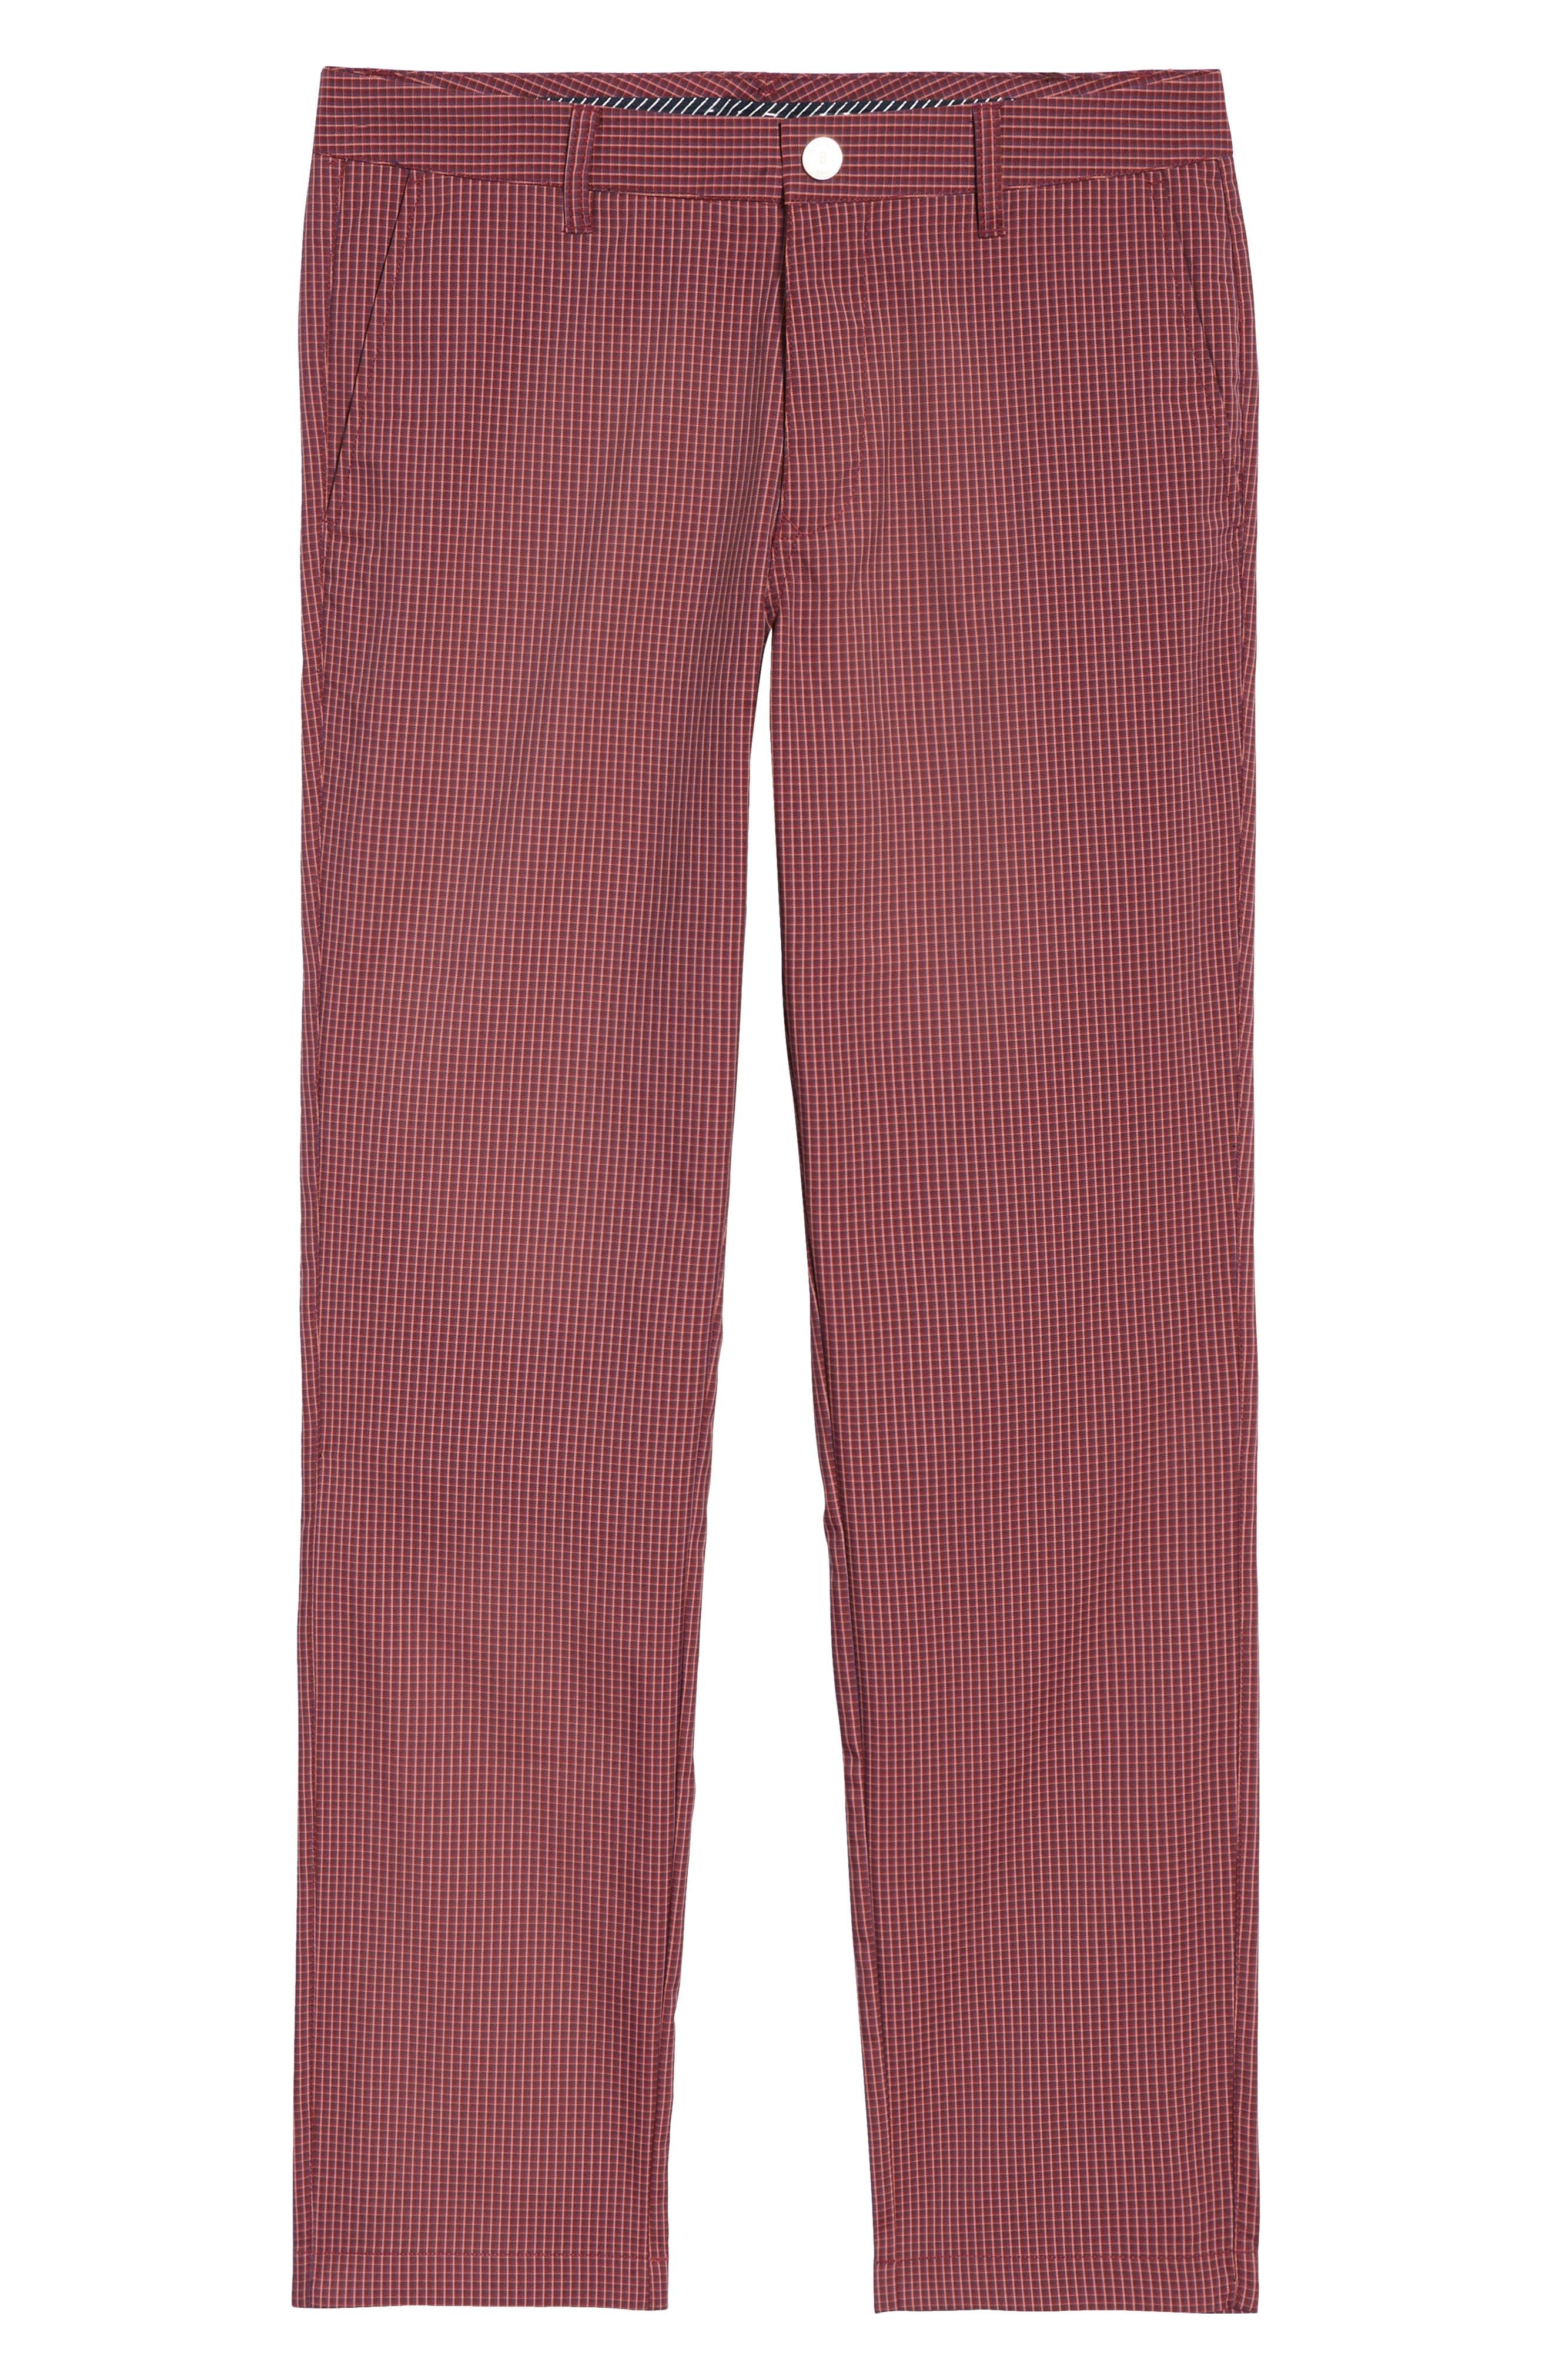 Highland Slim Fit Golf Pants,                             Alternate thumbnail 6, color,                             RED PLAID